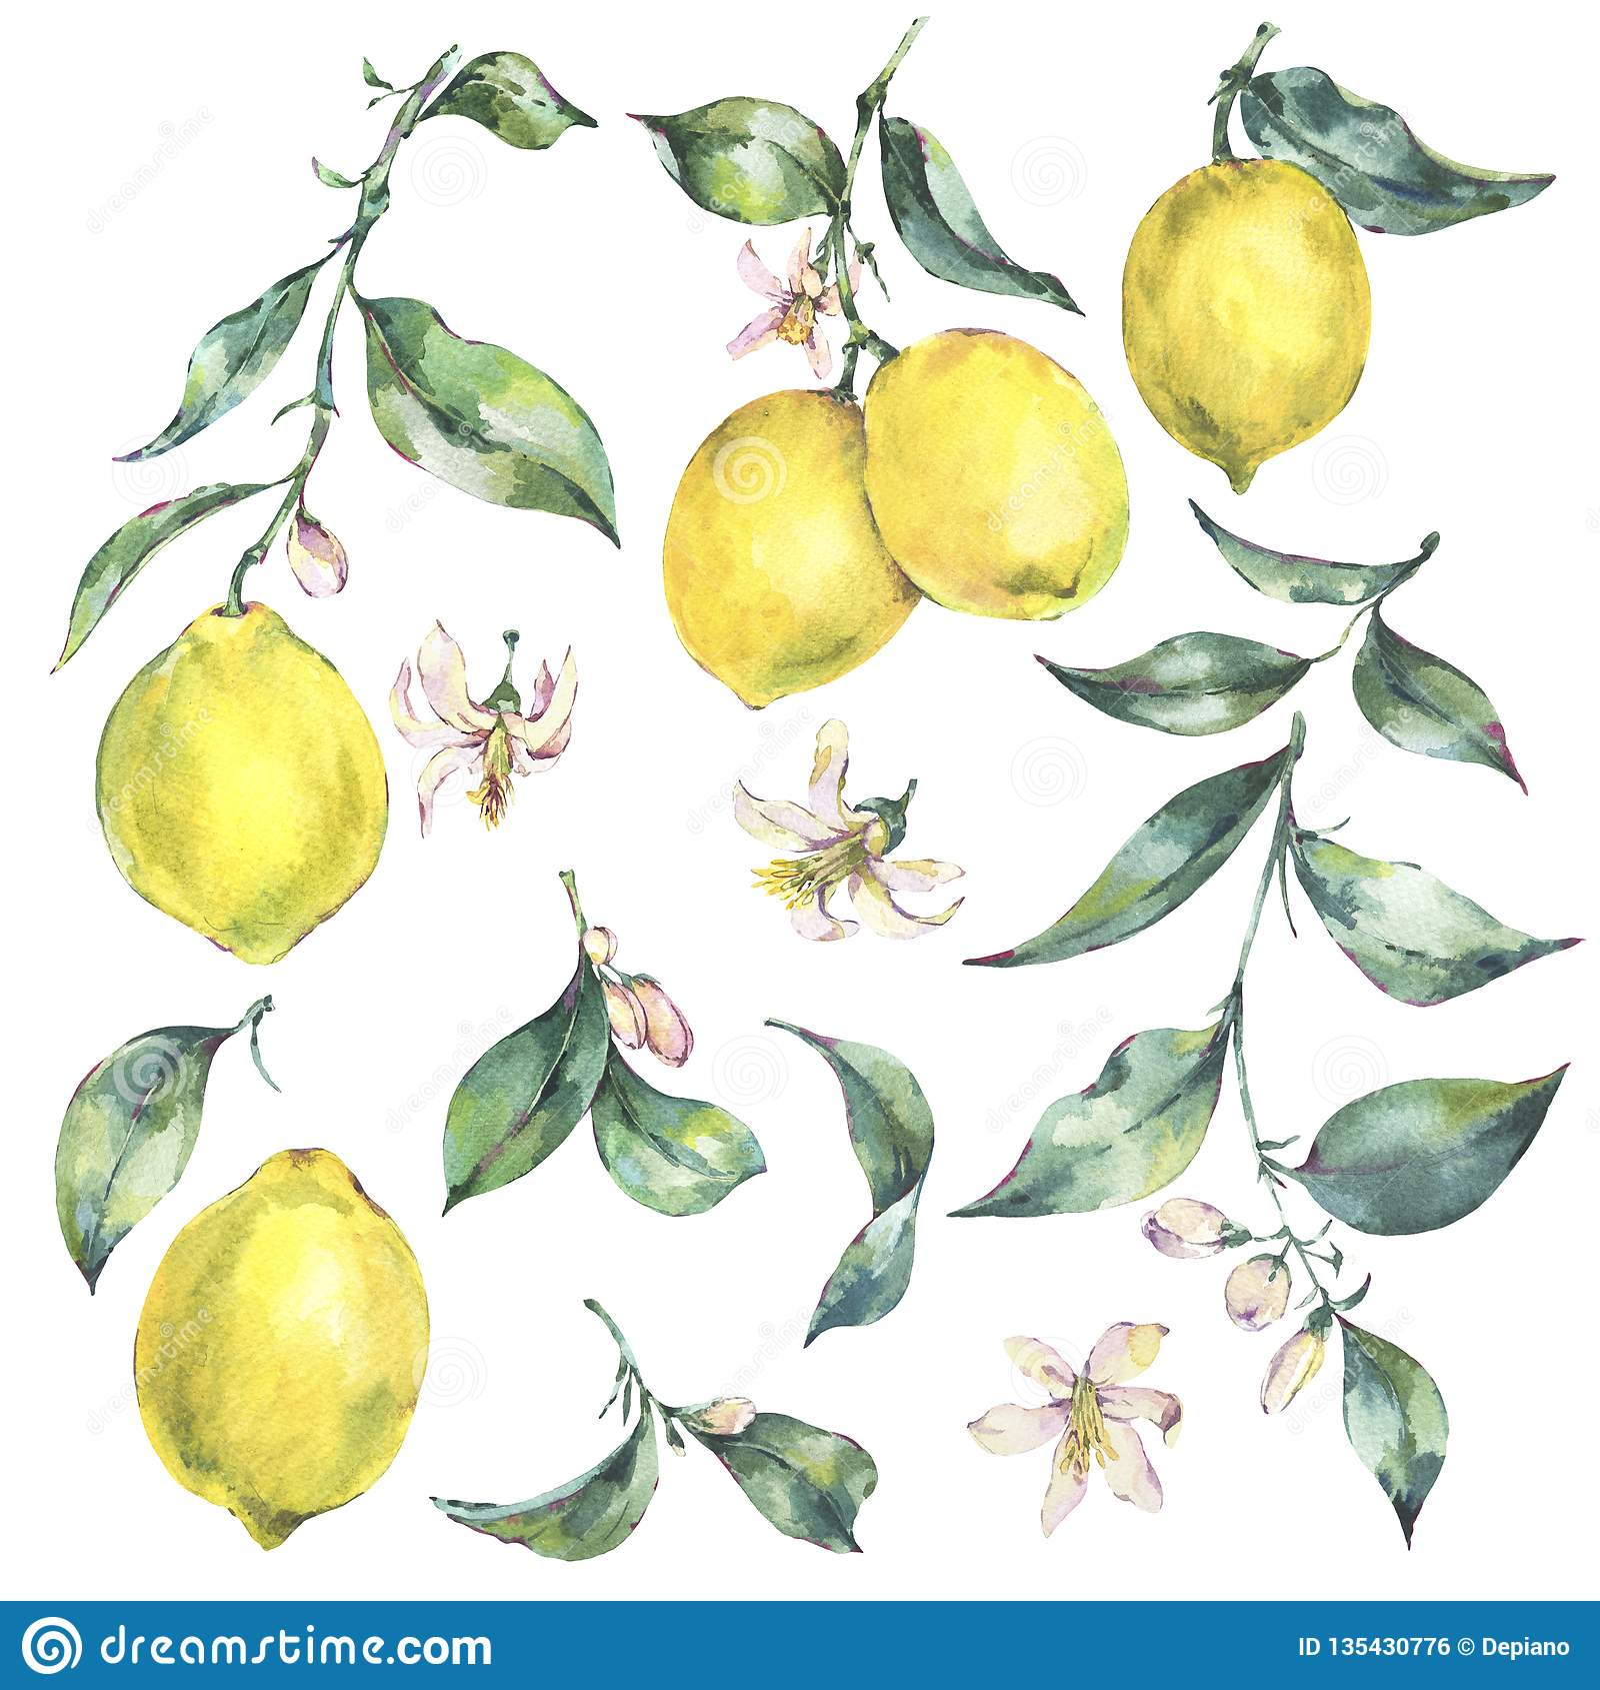 Watercolor vintage set of branch yellow fruit lemon